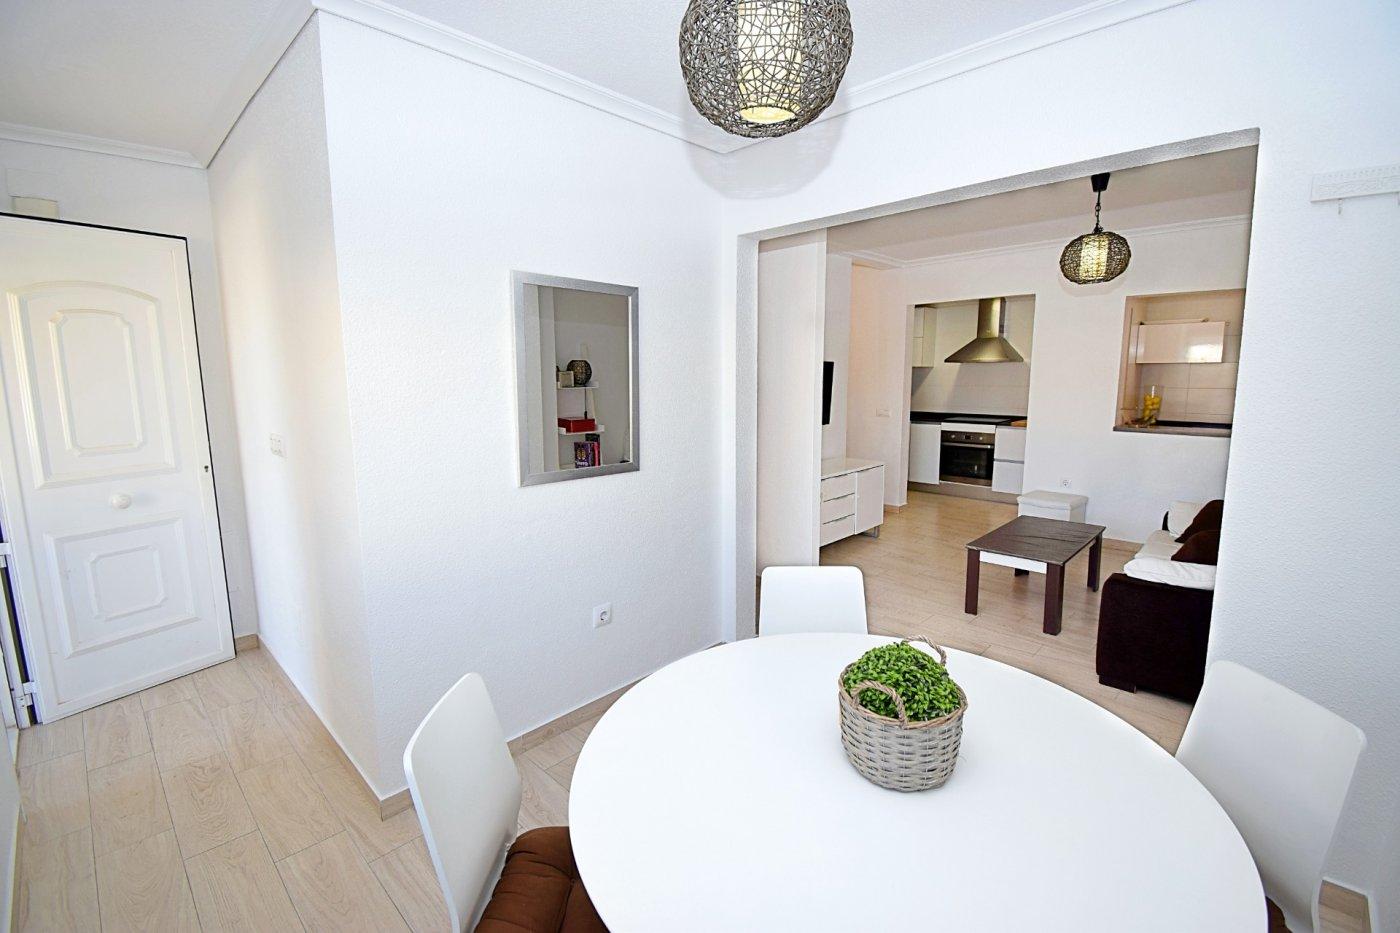 bungalow en gran-alacant · gran-alacant 129000€